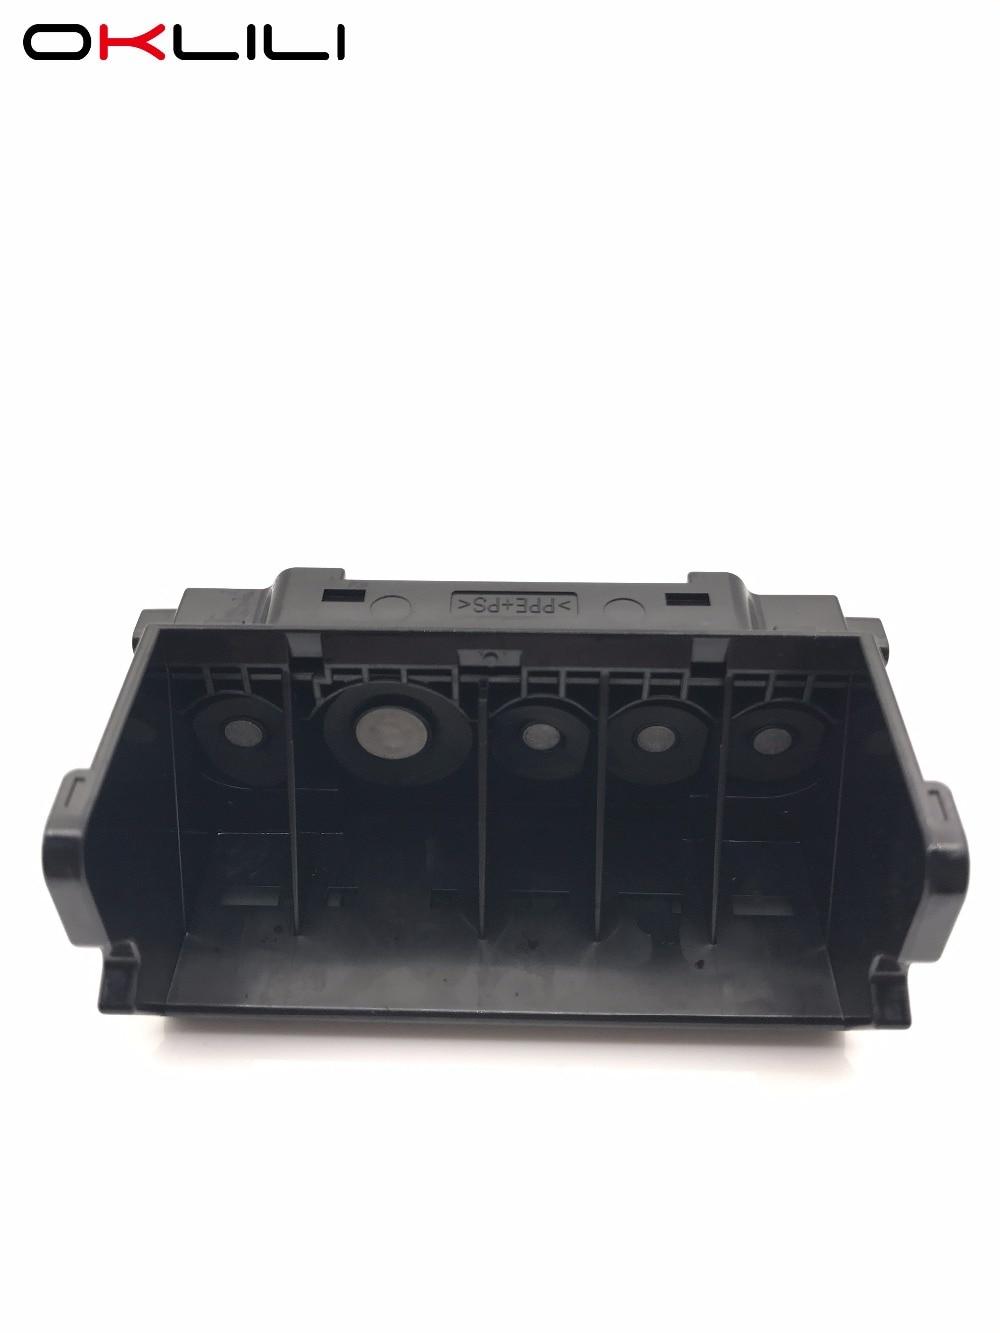 Image 3 - Печатающая головка QY6 0073 для Canon iP3600 iP3680 MP540 MP550  MP560 MP568 MP620 MX860 MX868 MX870 MX878 MG5140 MG5150 MG5180print  headqy6-0073 printheadprinthead qy6-0073